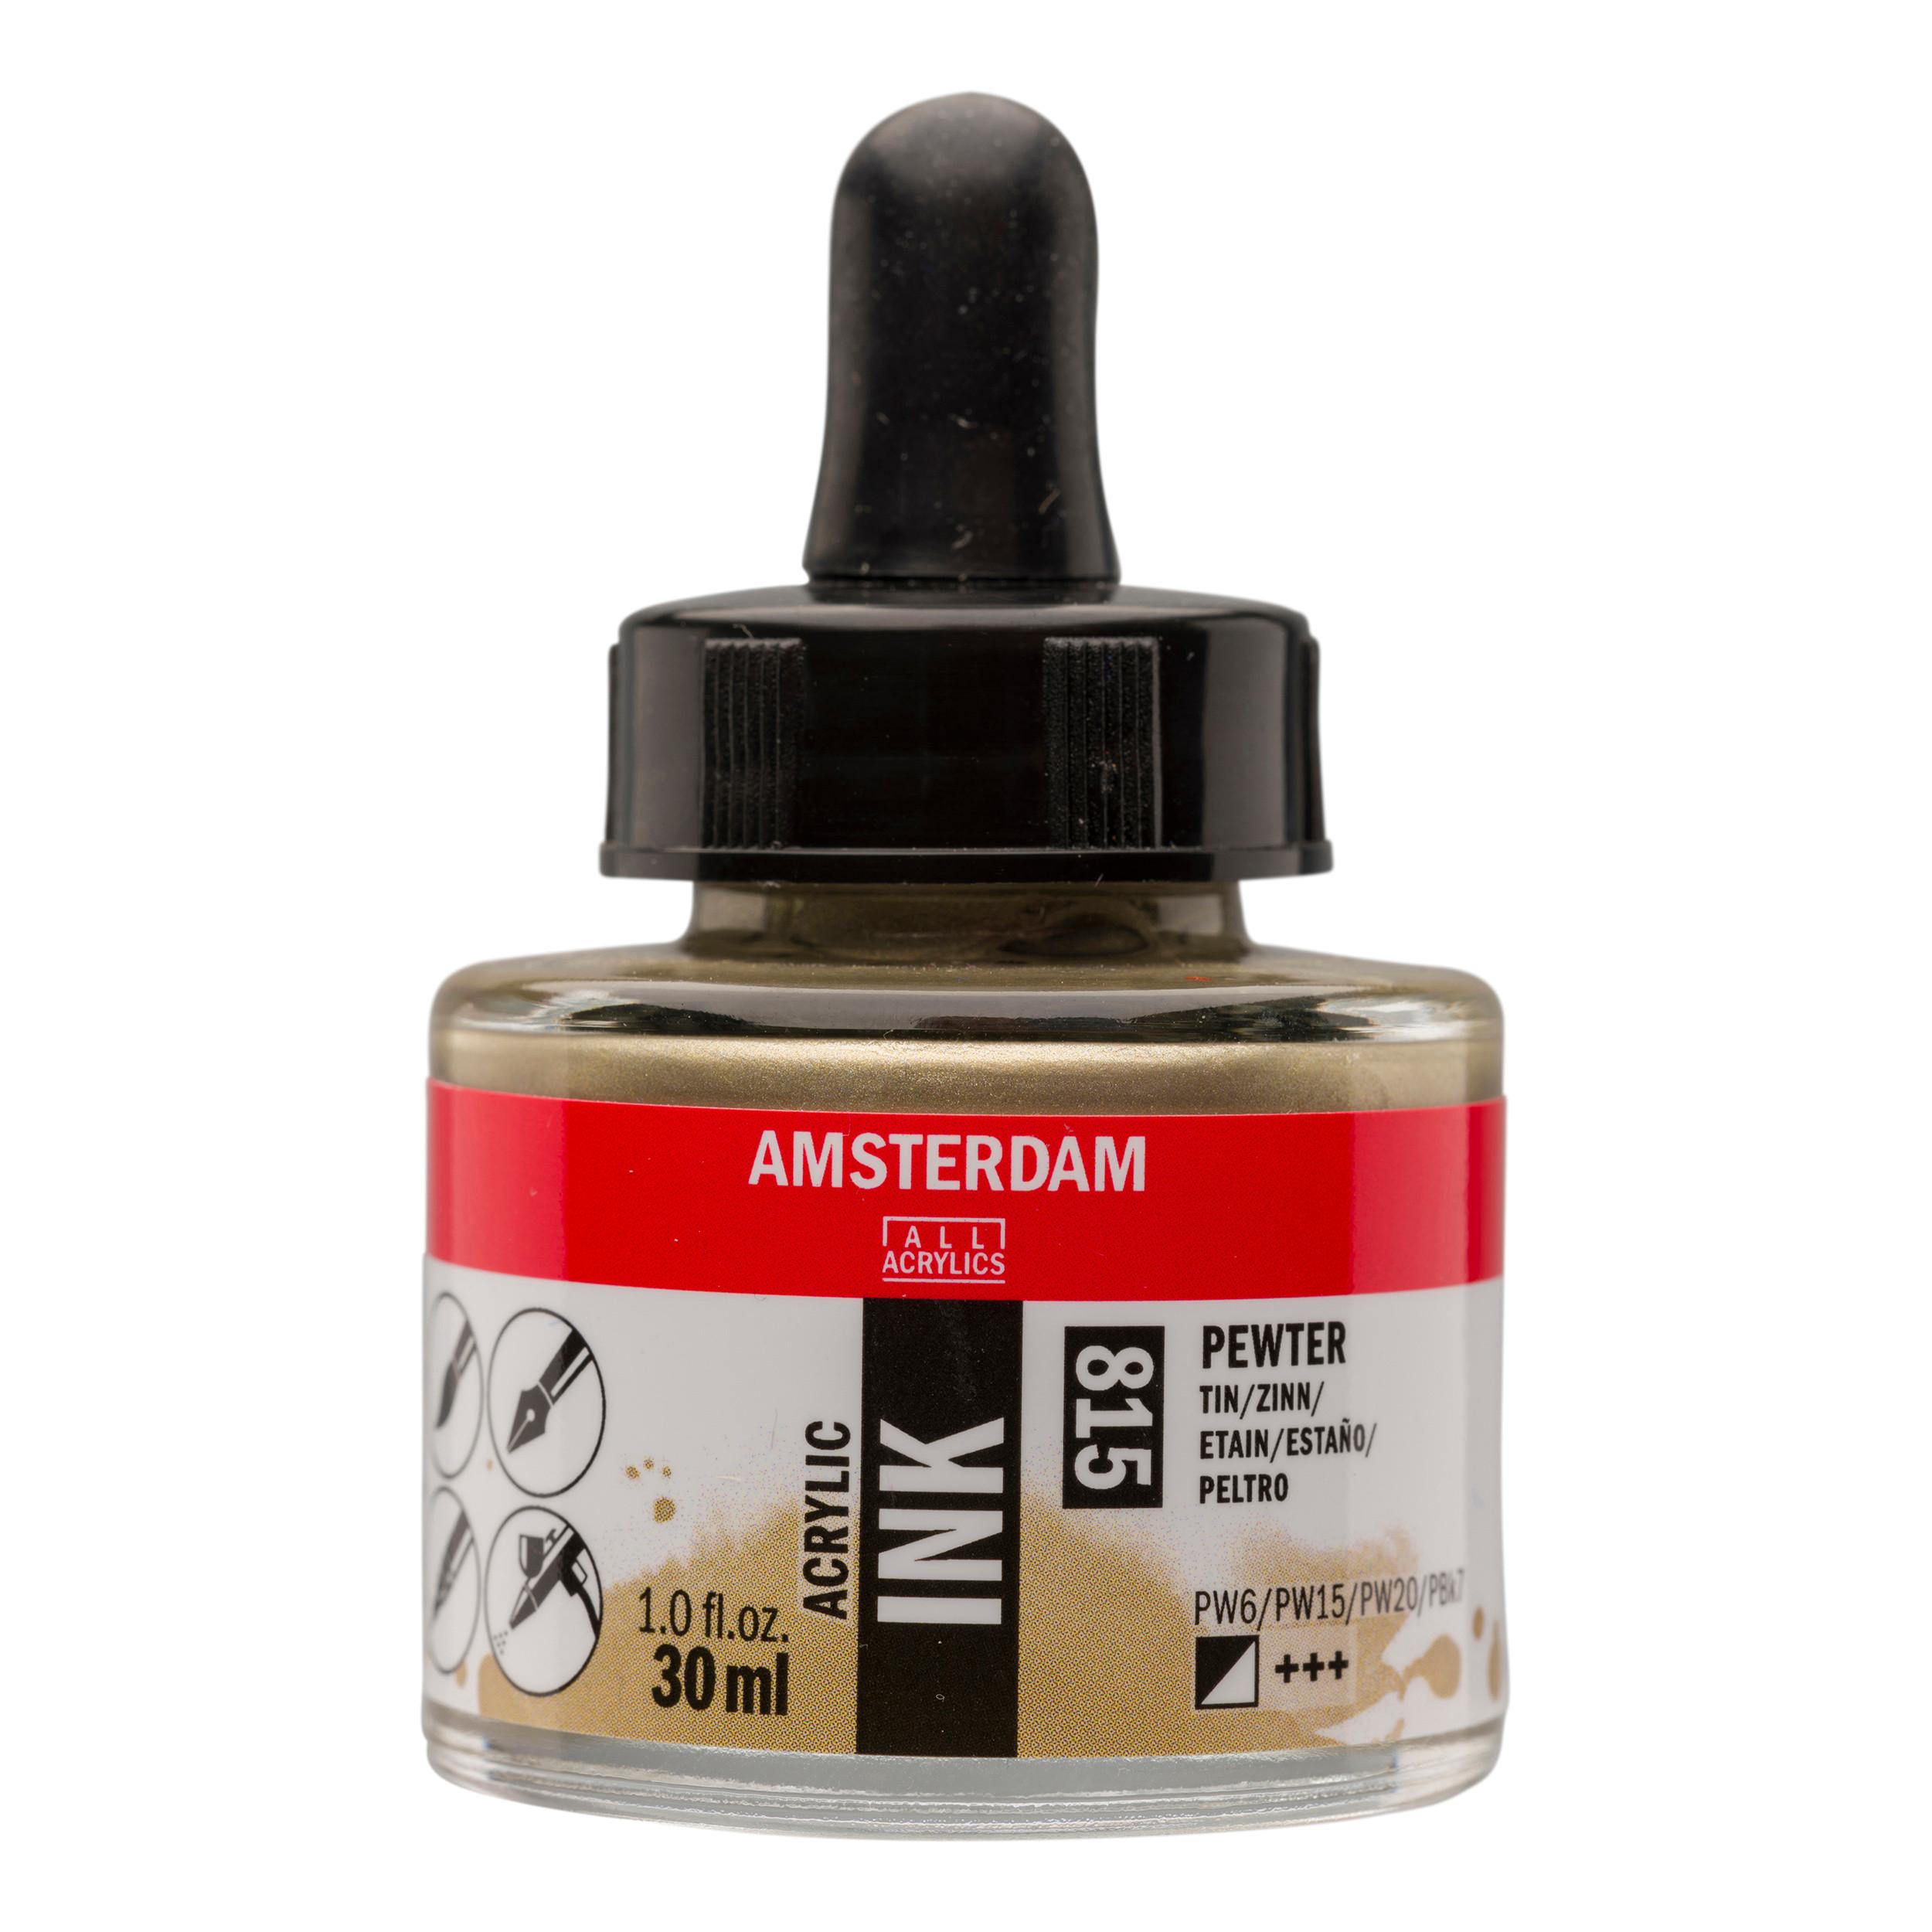 Amsterdam Acrylic Ink Bottle 30 ml Pewter 815